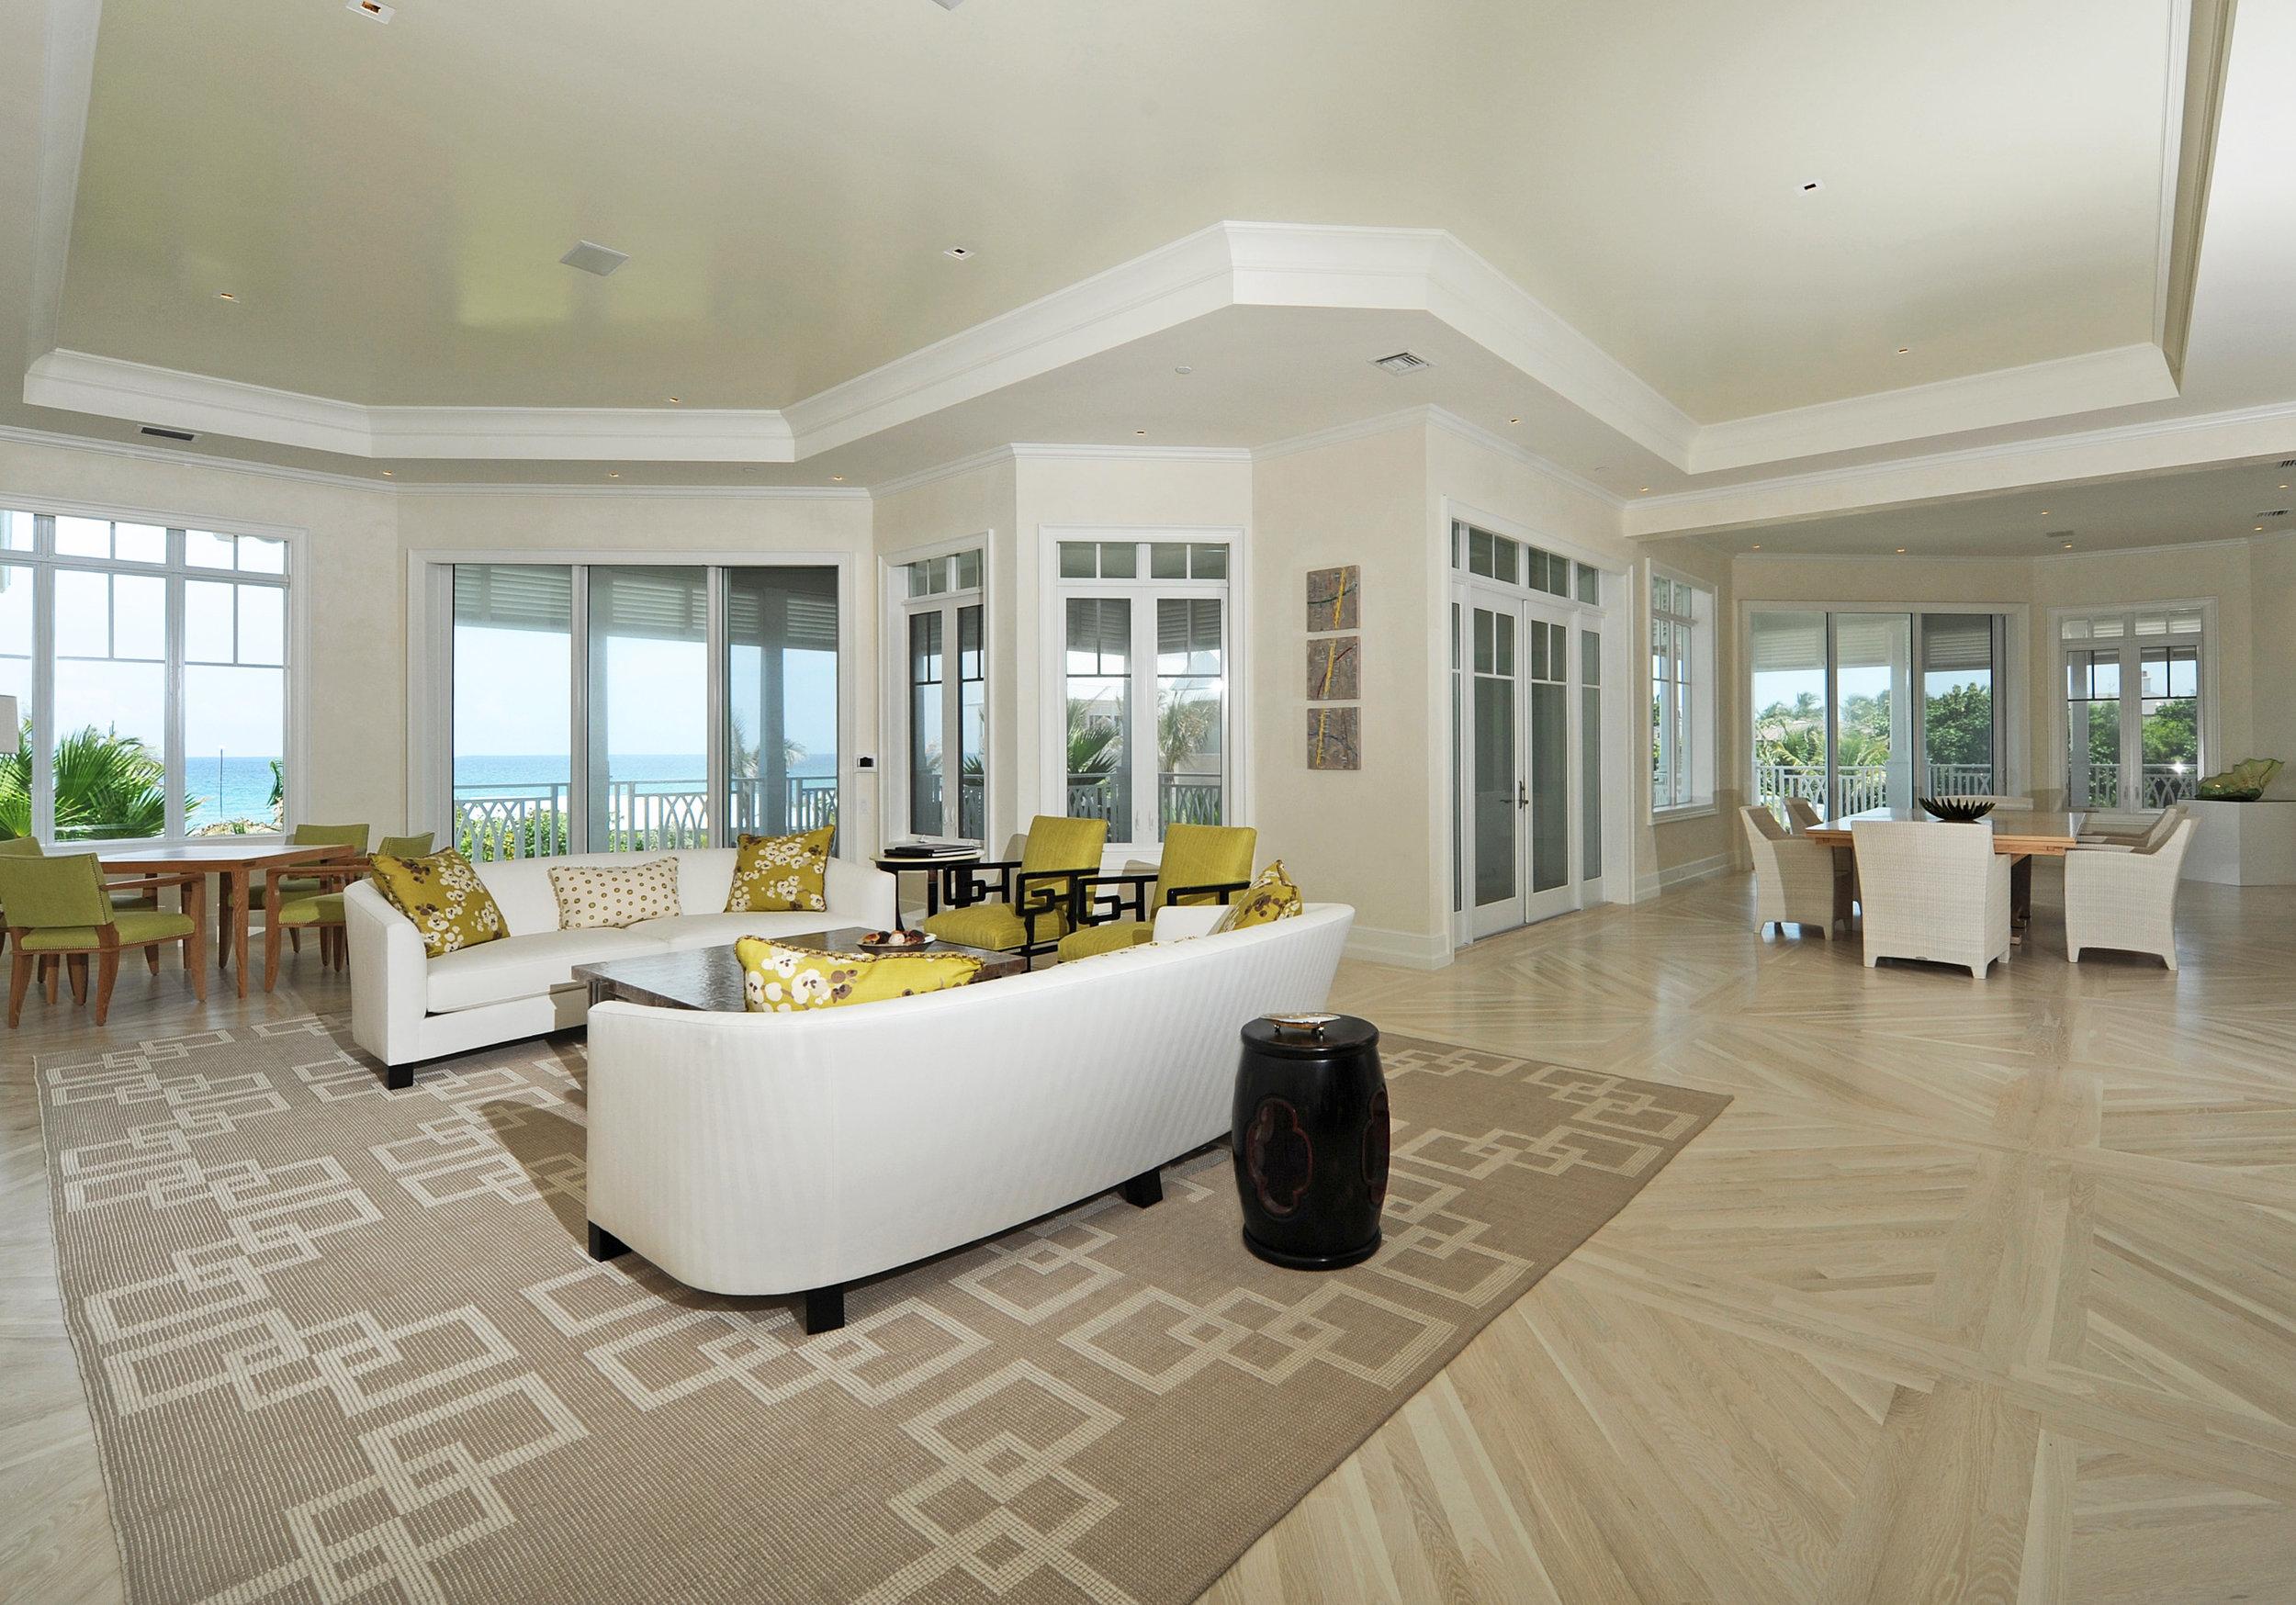 Custom Condominium | Delray Beach, FL  Architect | Randall Stofft  Interior Designer | Bunny Williams   View Project